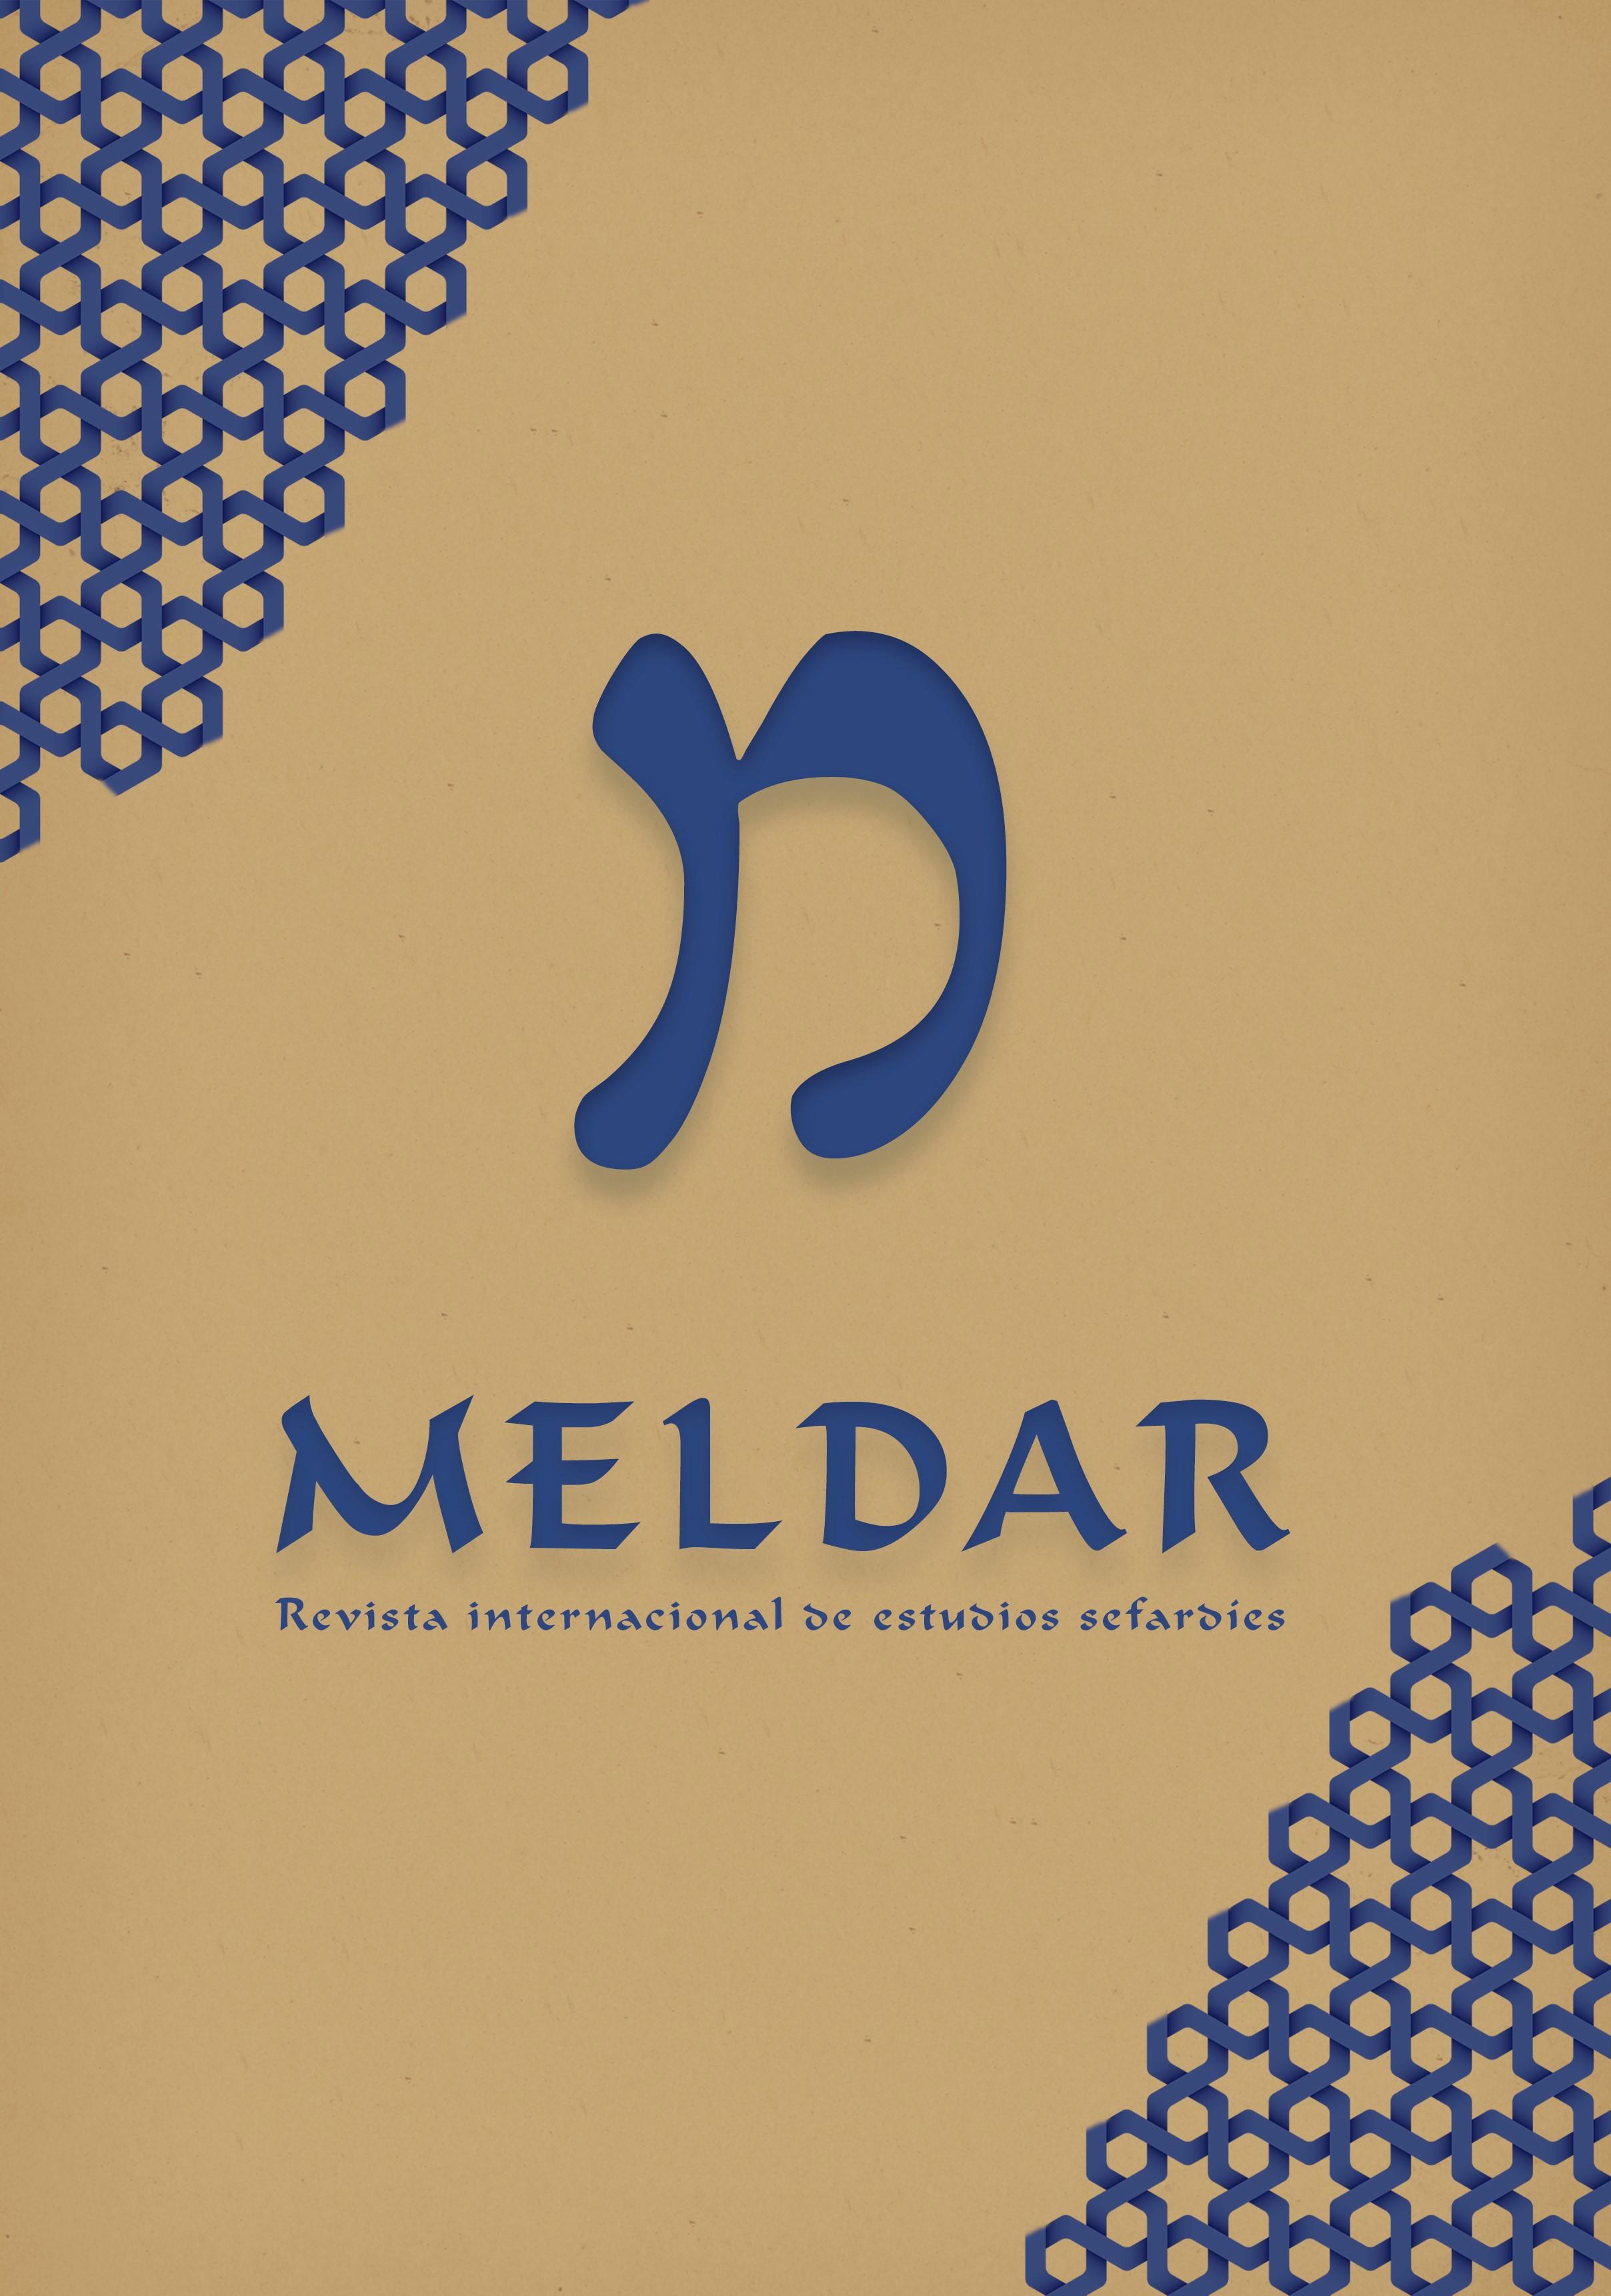 MELDAR